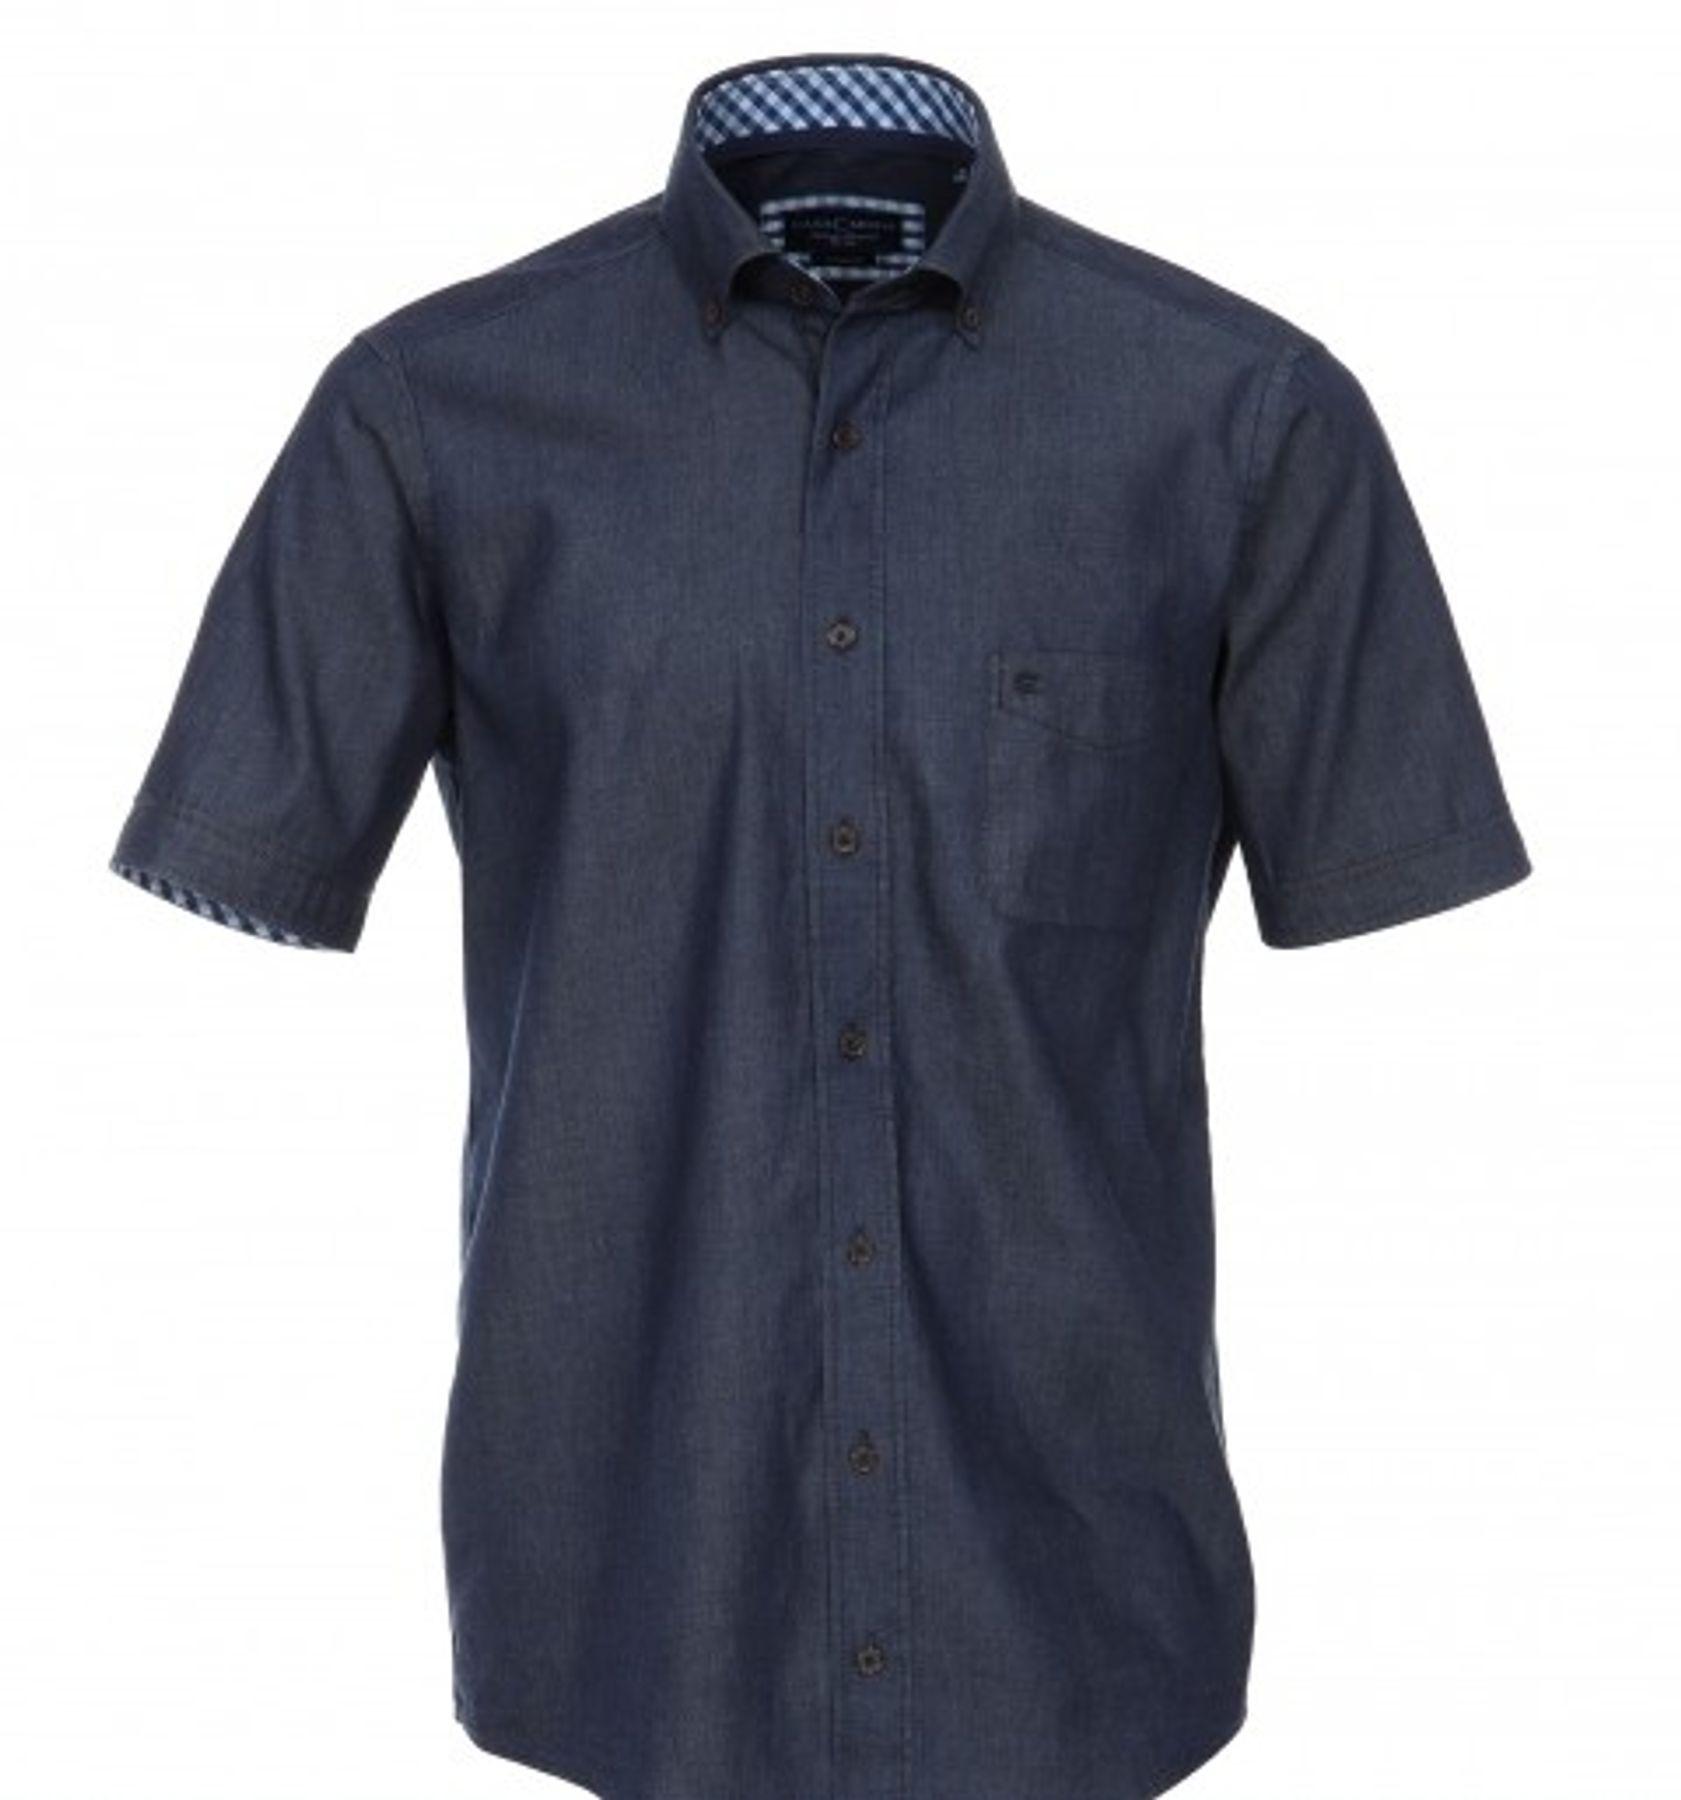 Casamoda - Casual Fit - Herren Jeans Hemd in Anthrazit oder Blau, Kurzarm (008303) – Bild 1